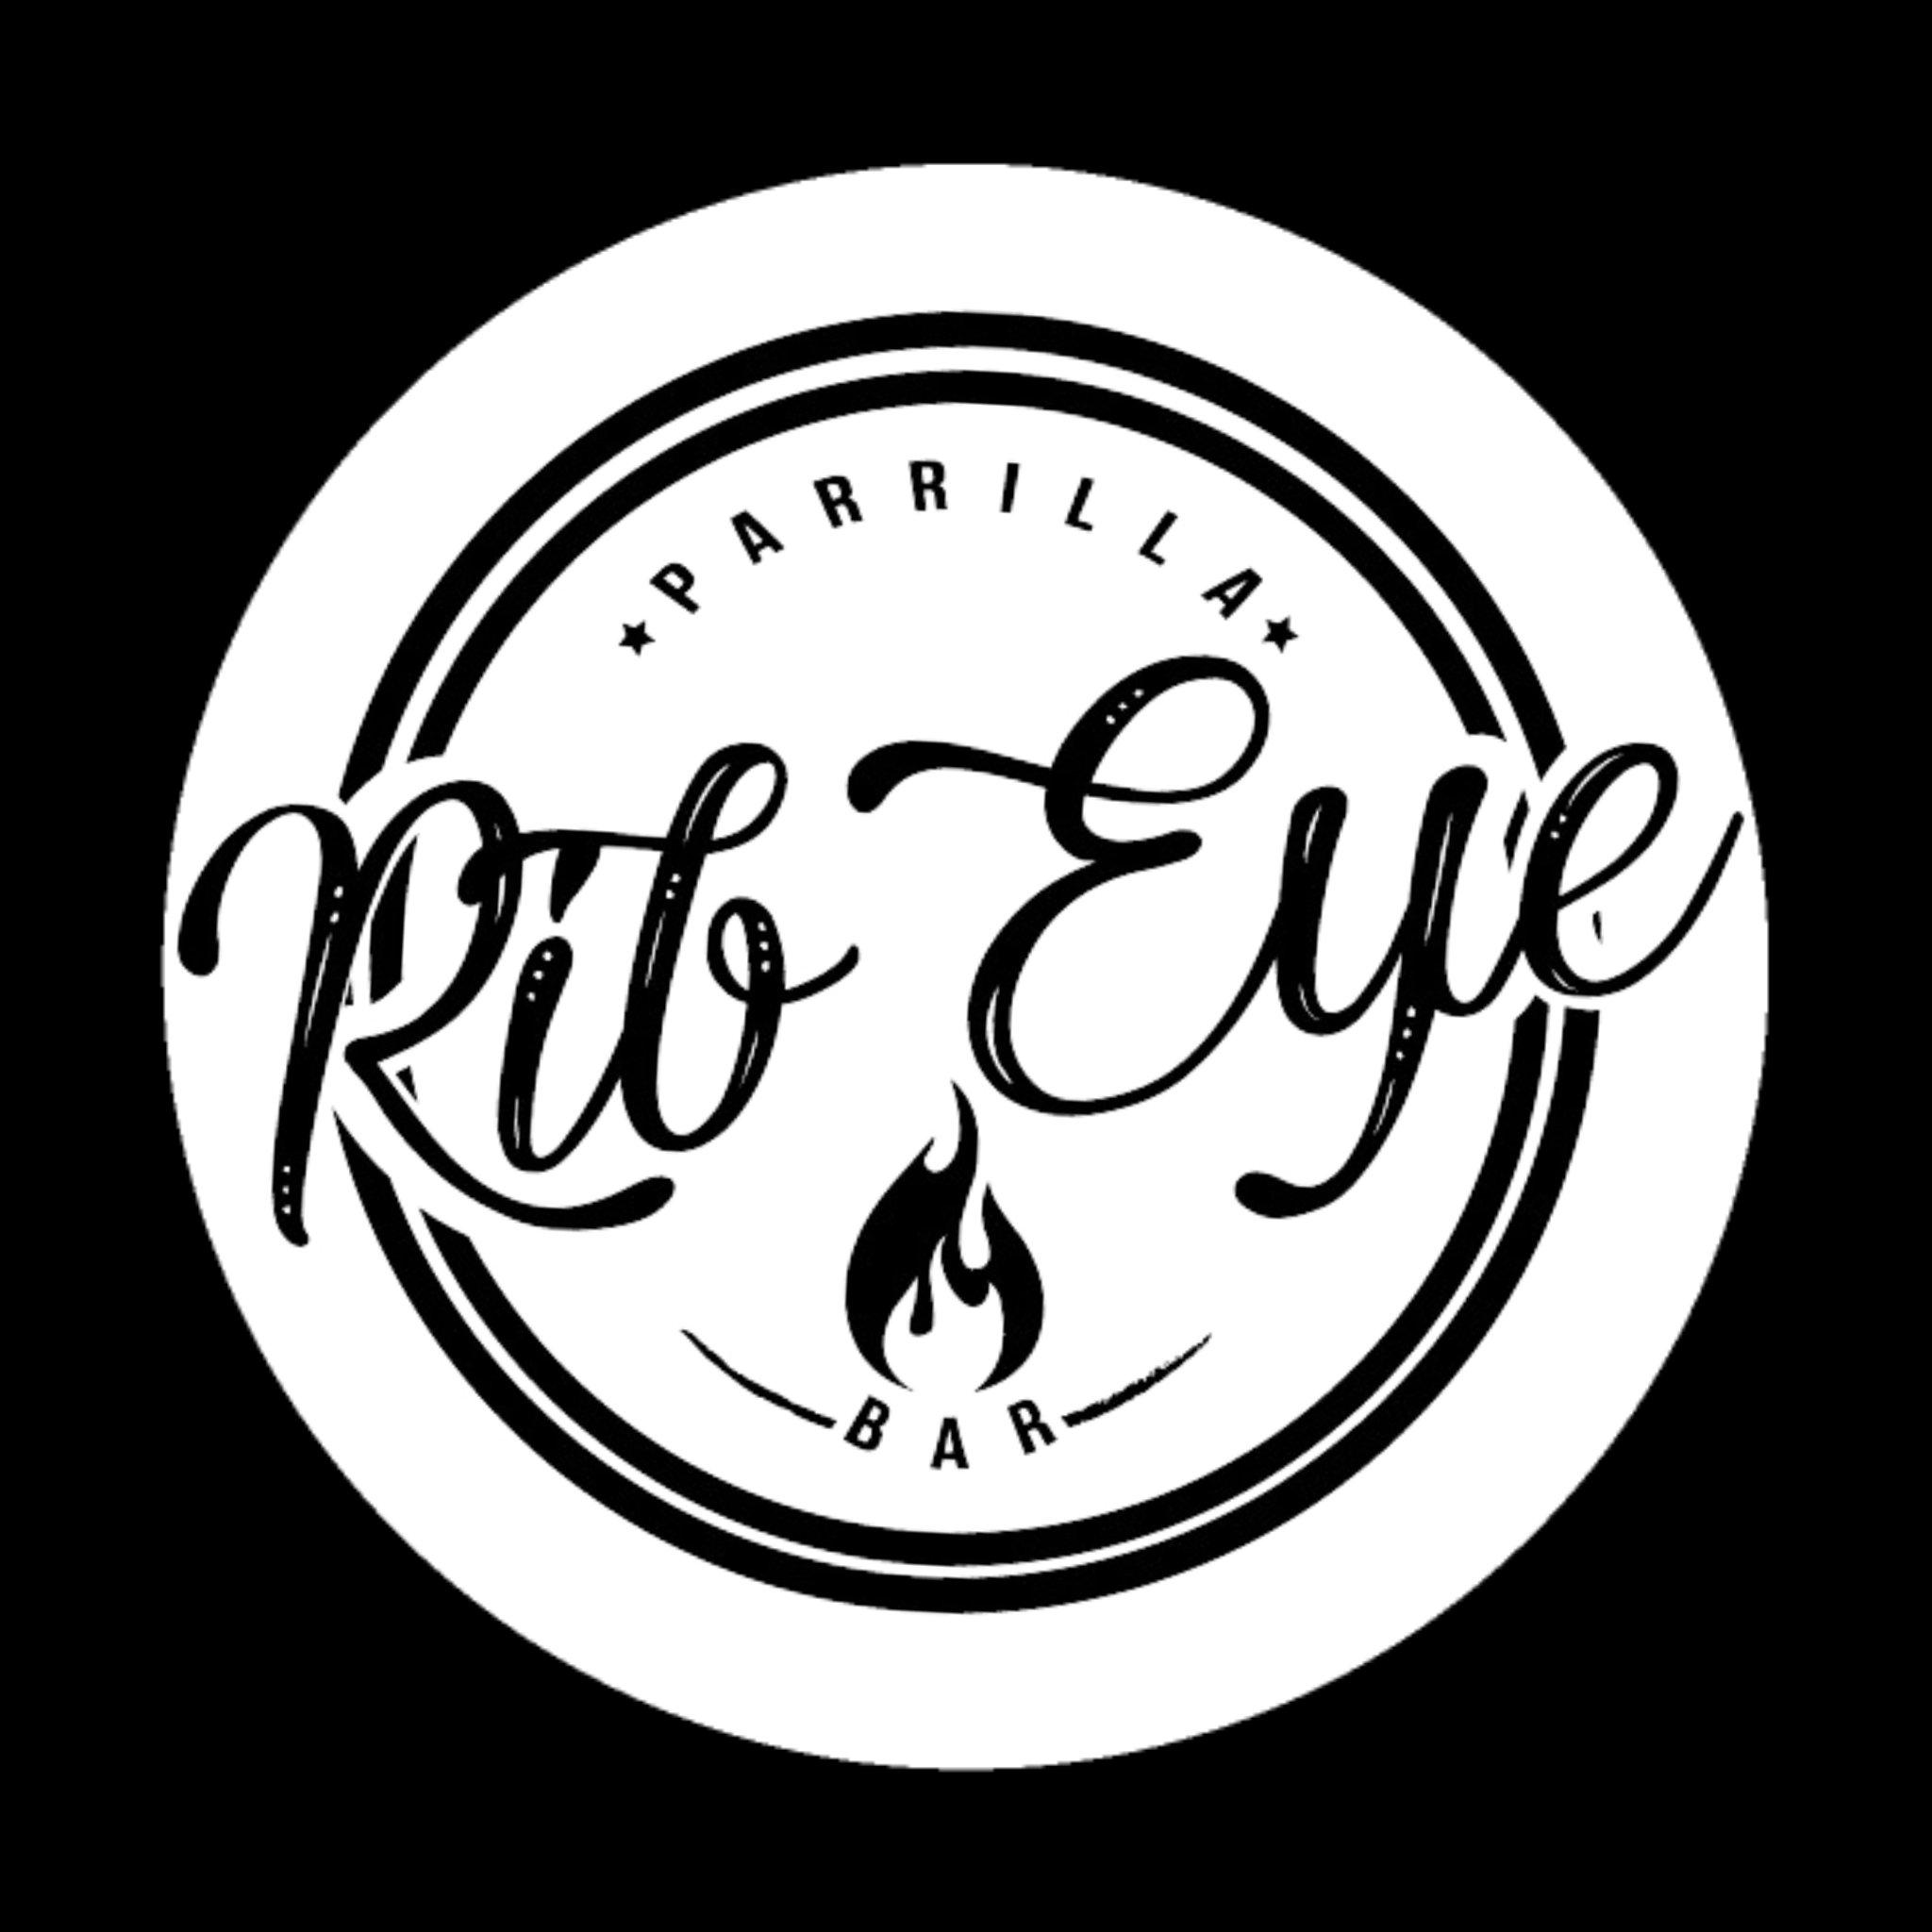 Rib Eye Parrilla Bar